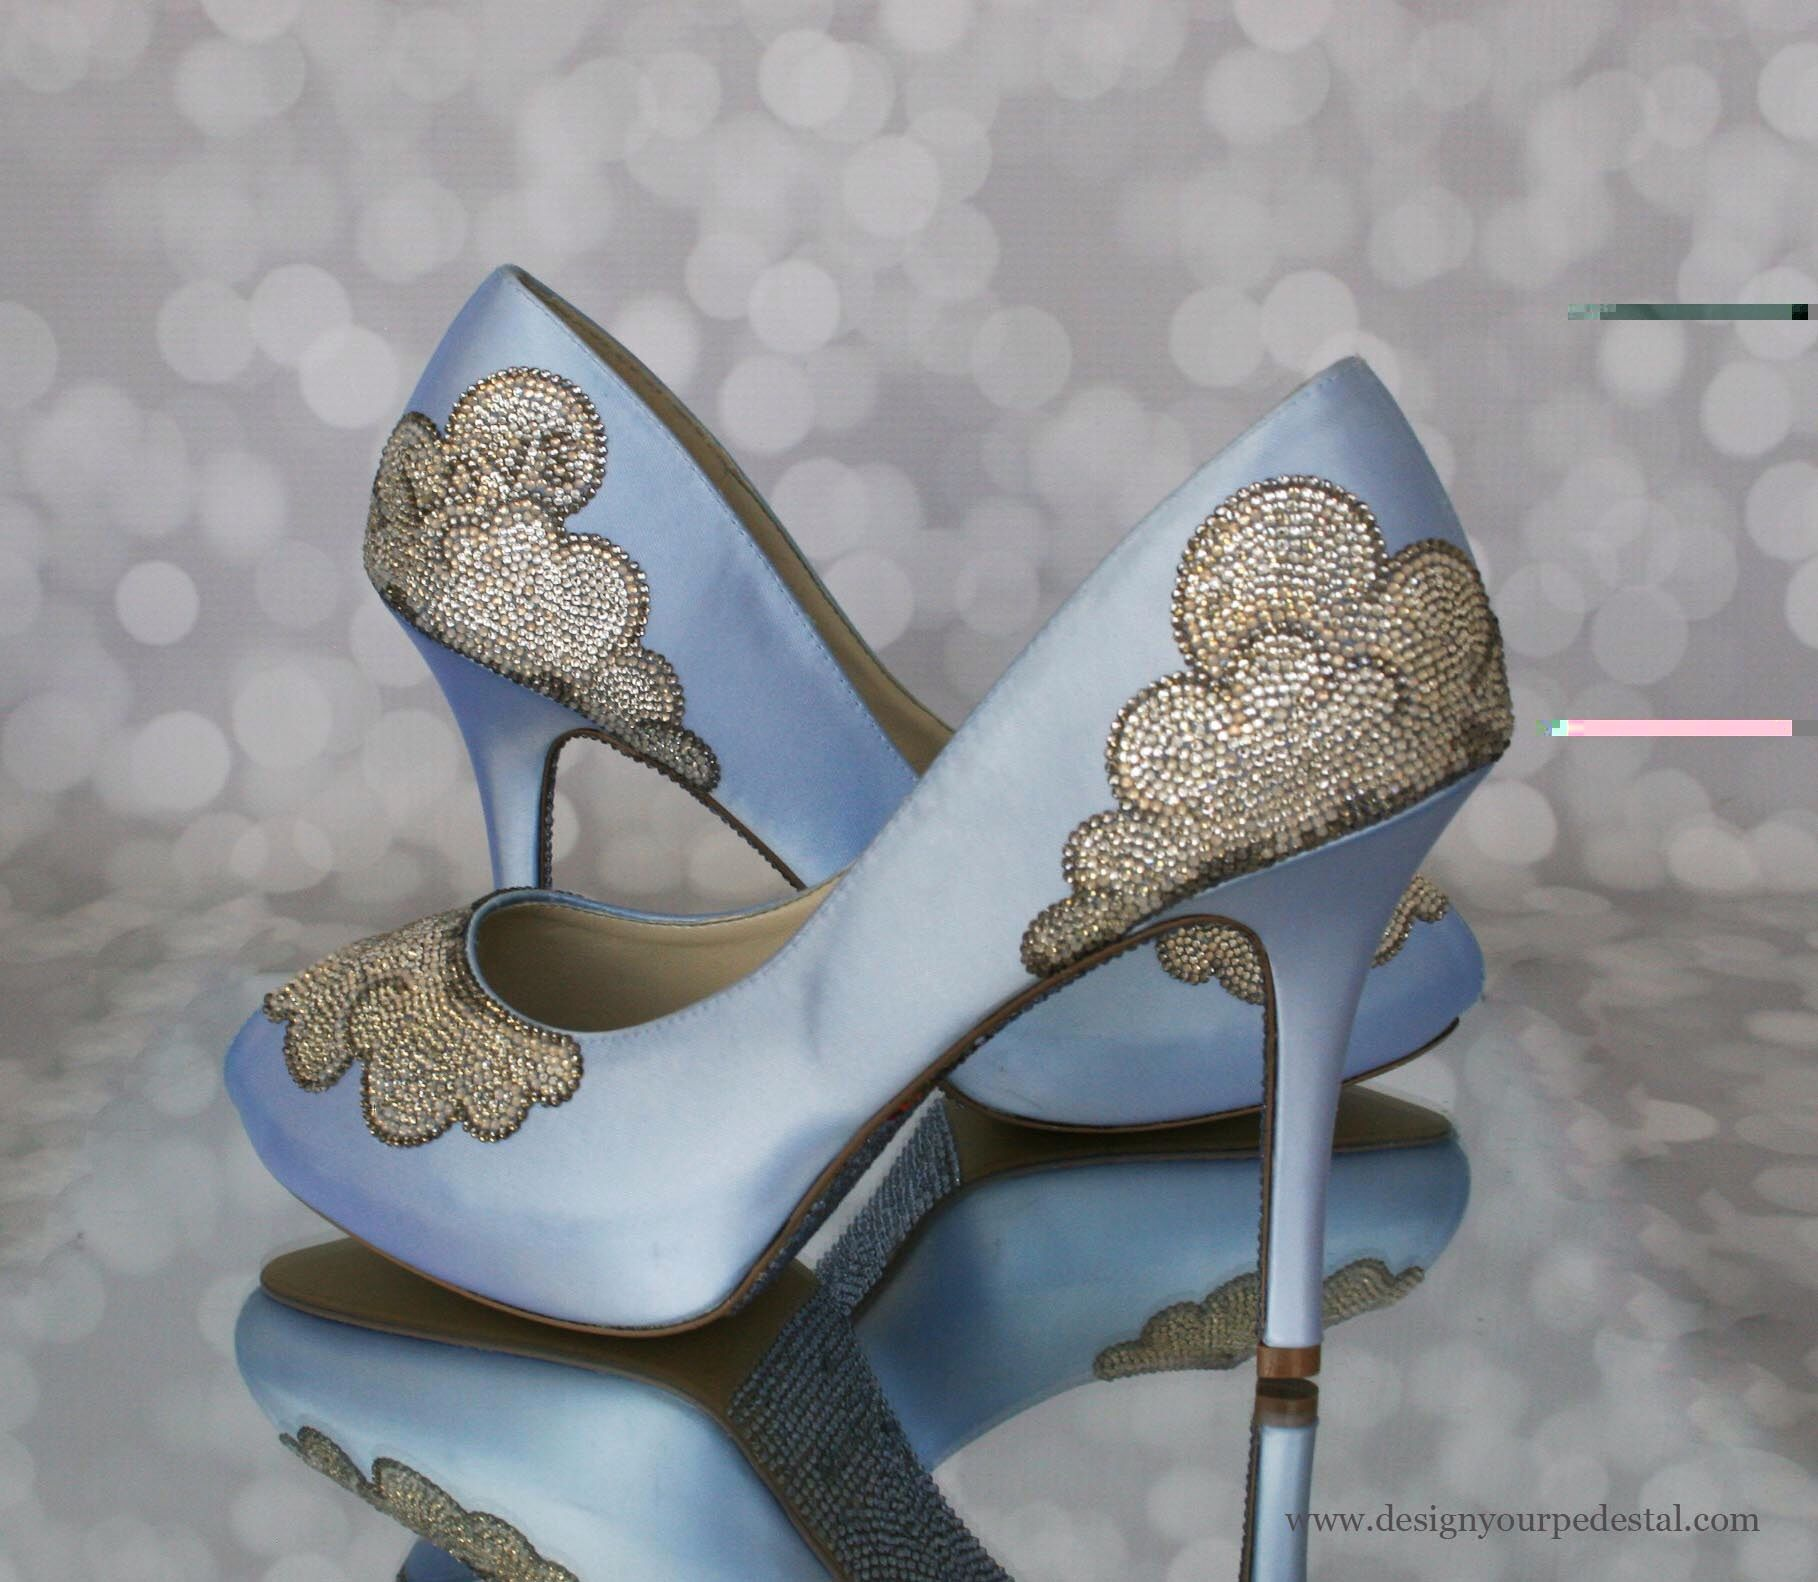 My Wedding Shoes Design Your Pedestal Capturing Me So